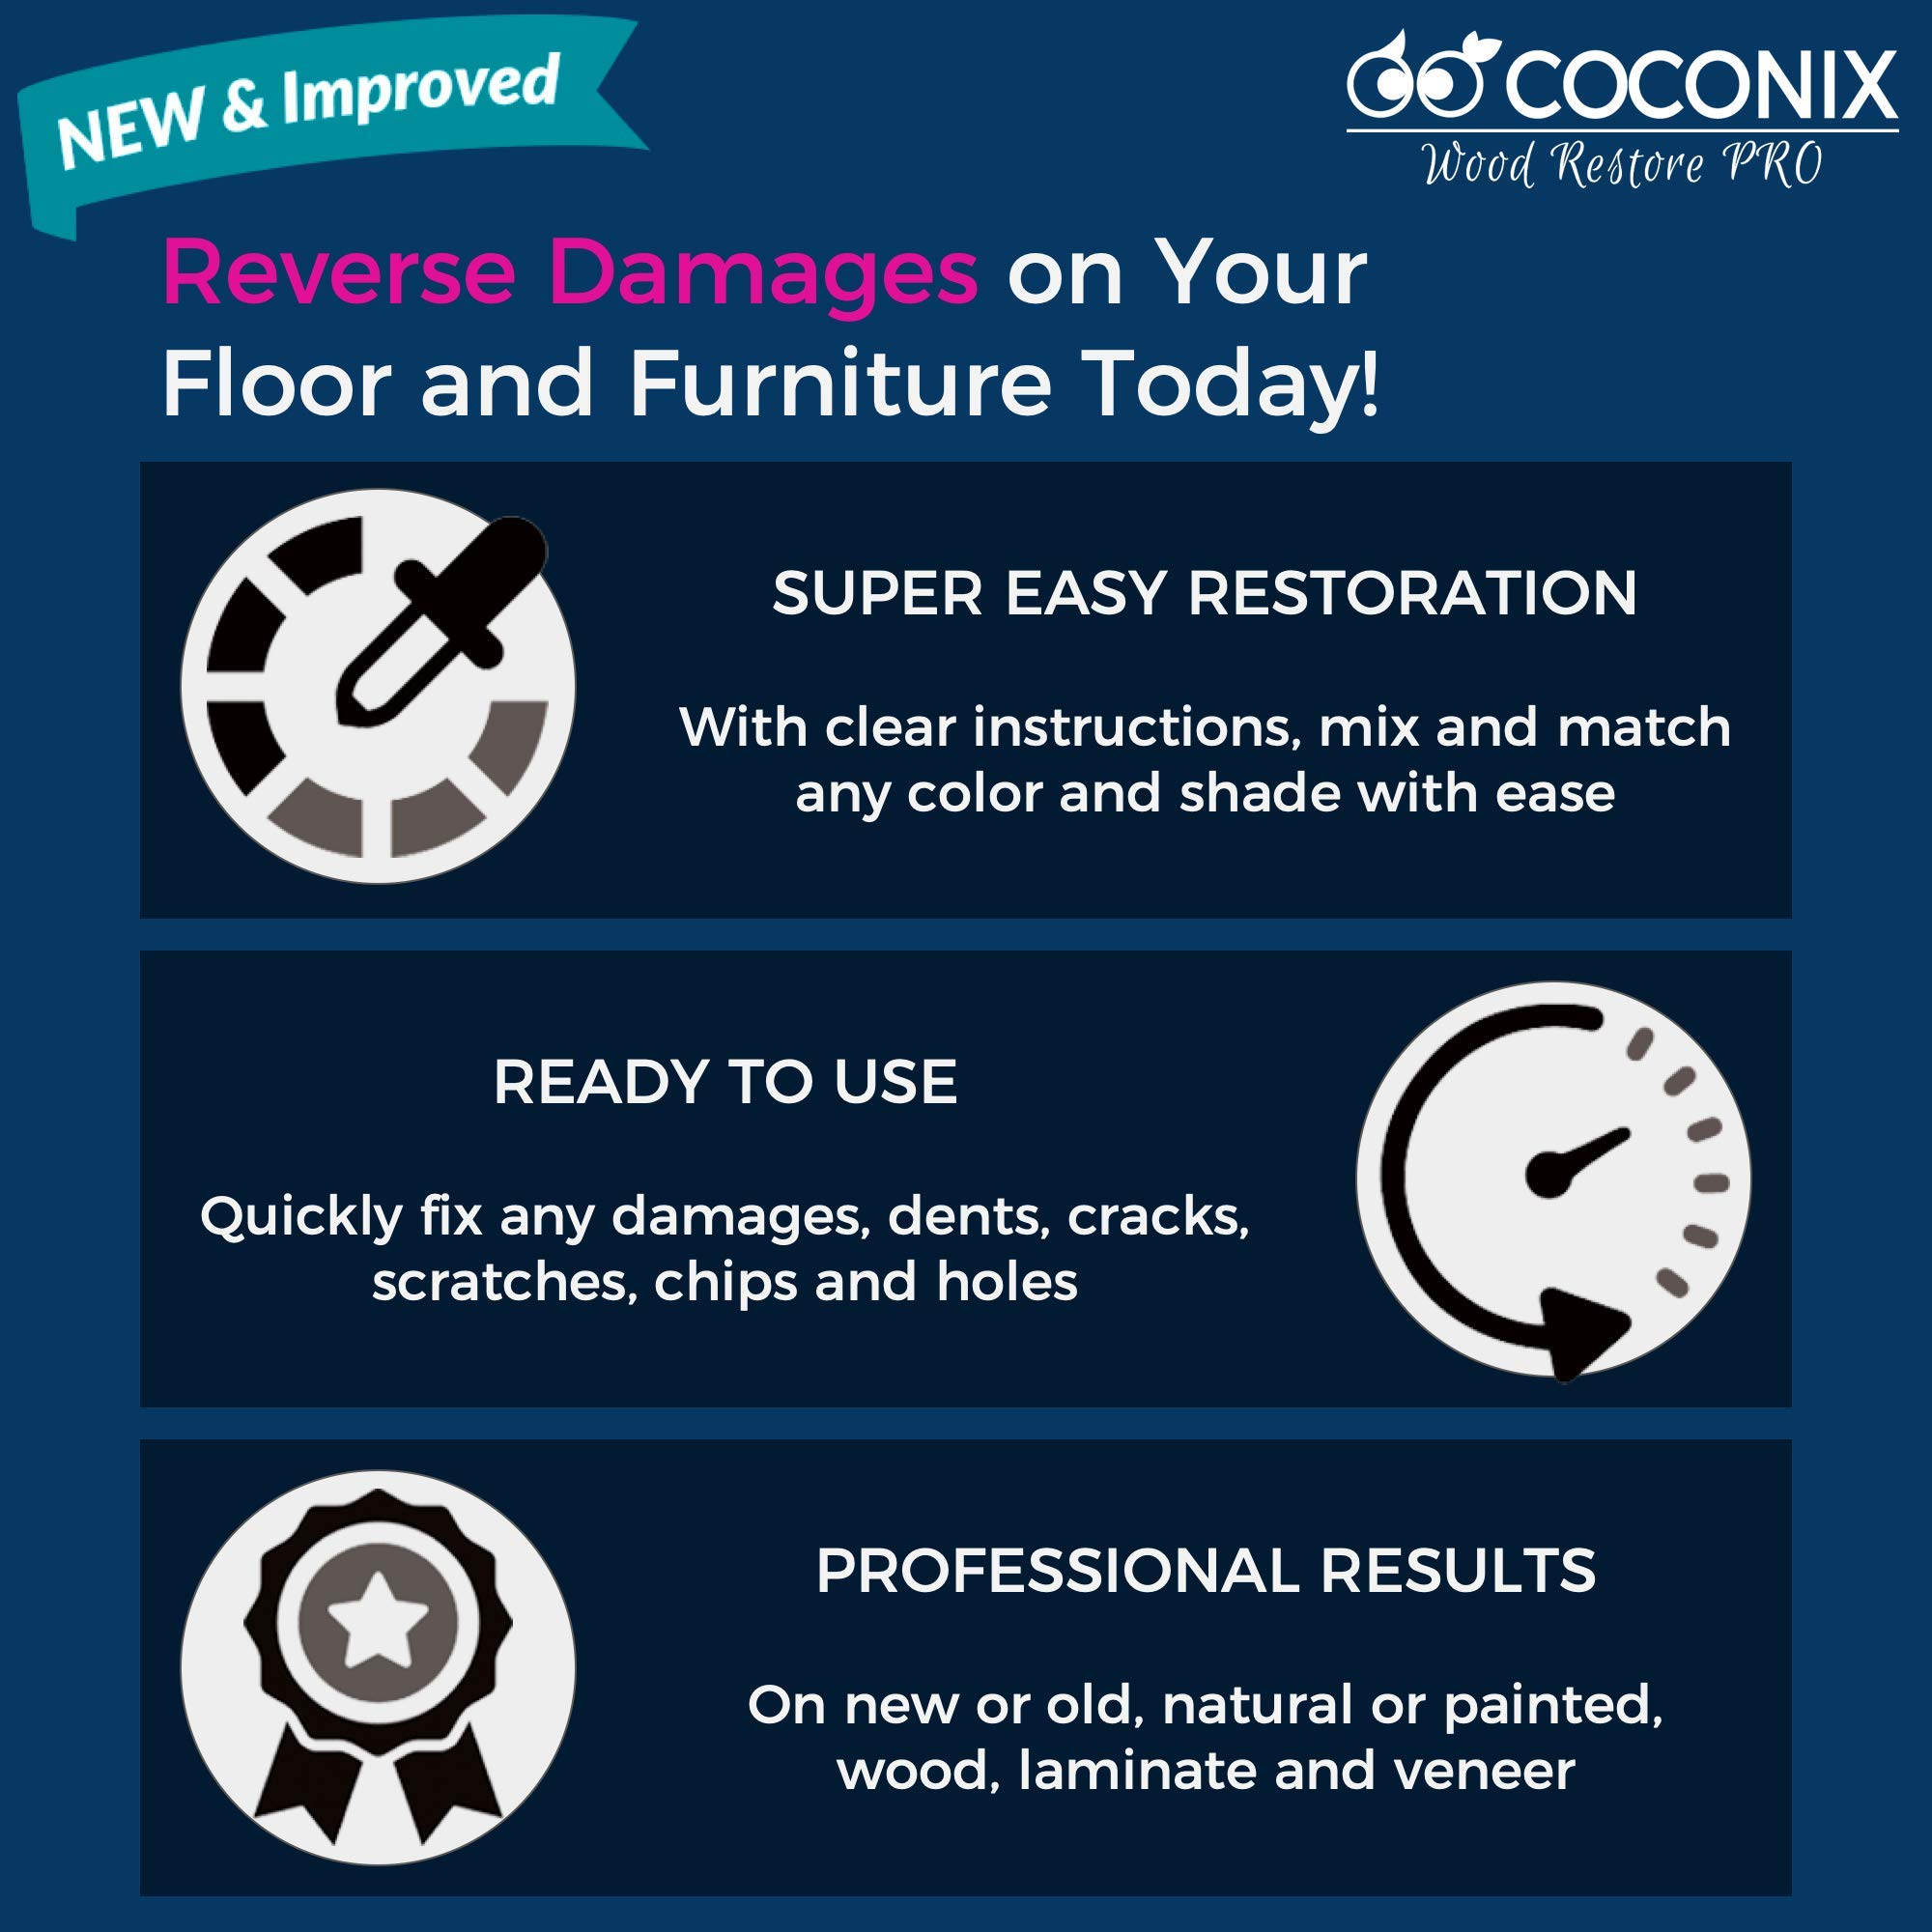 Coconix Wood Restore PRO - Professional Floor & Furniture Repair Kit by Coconix (Image #5)